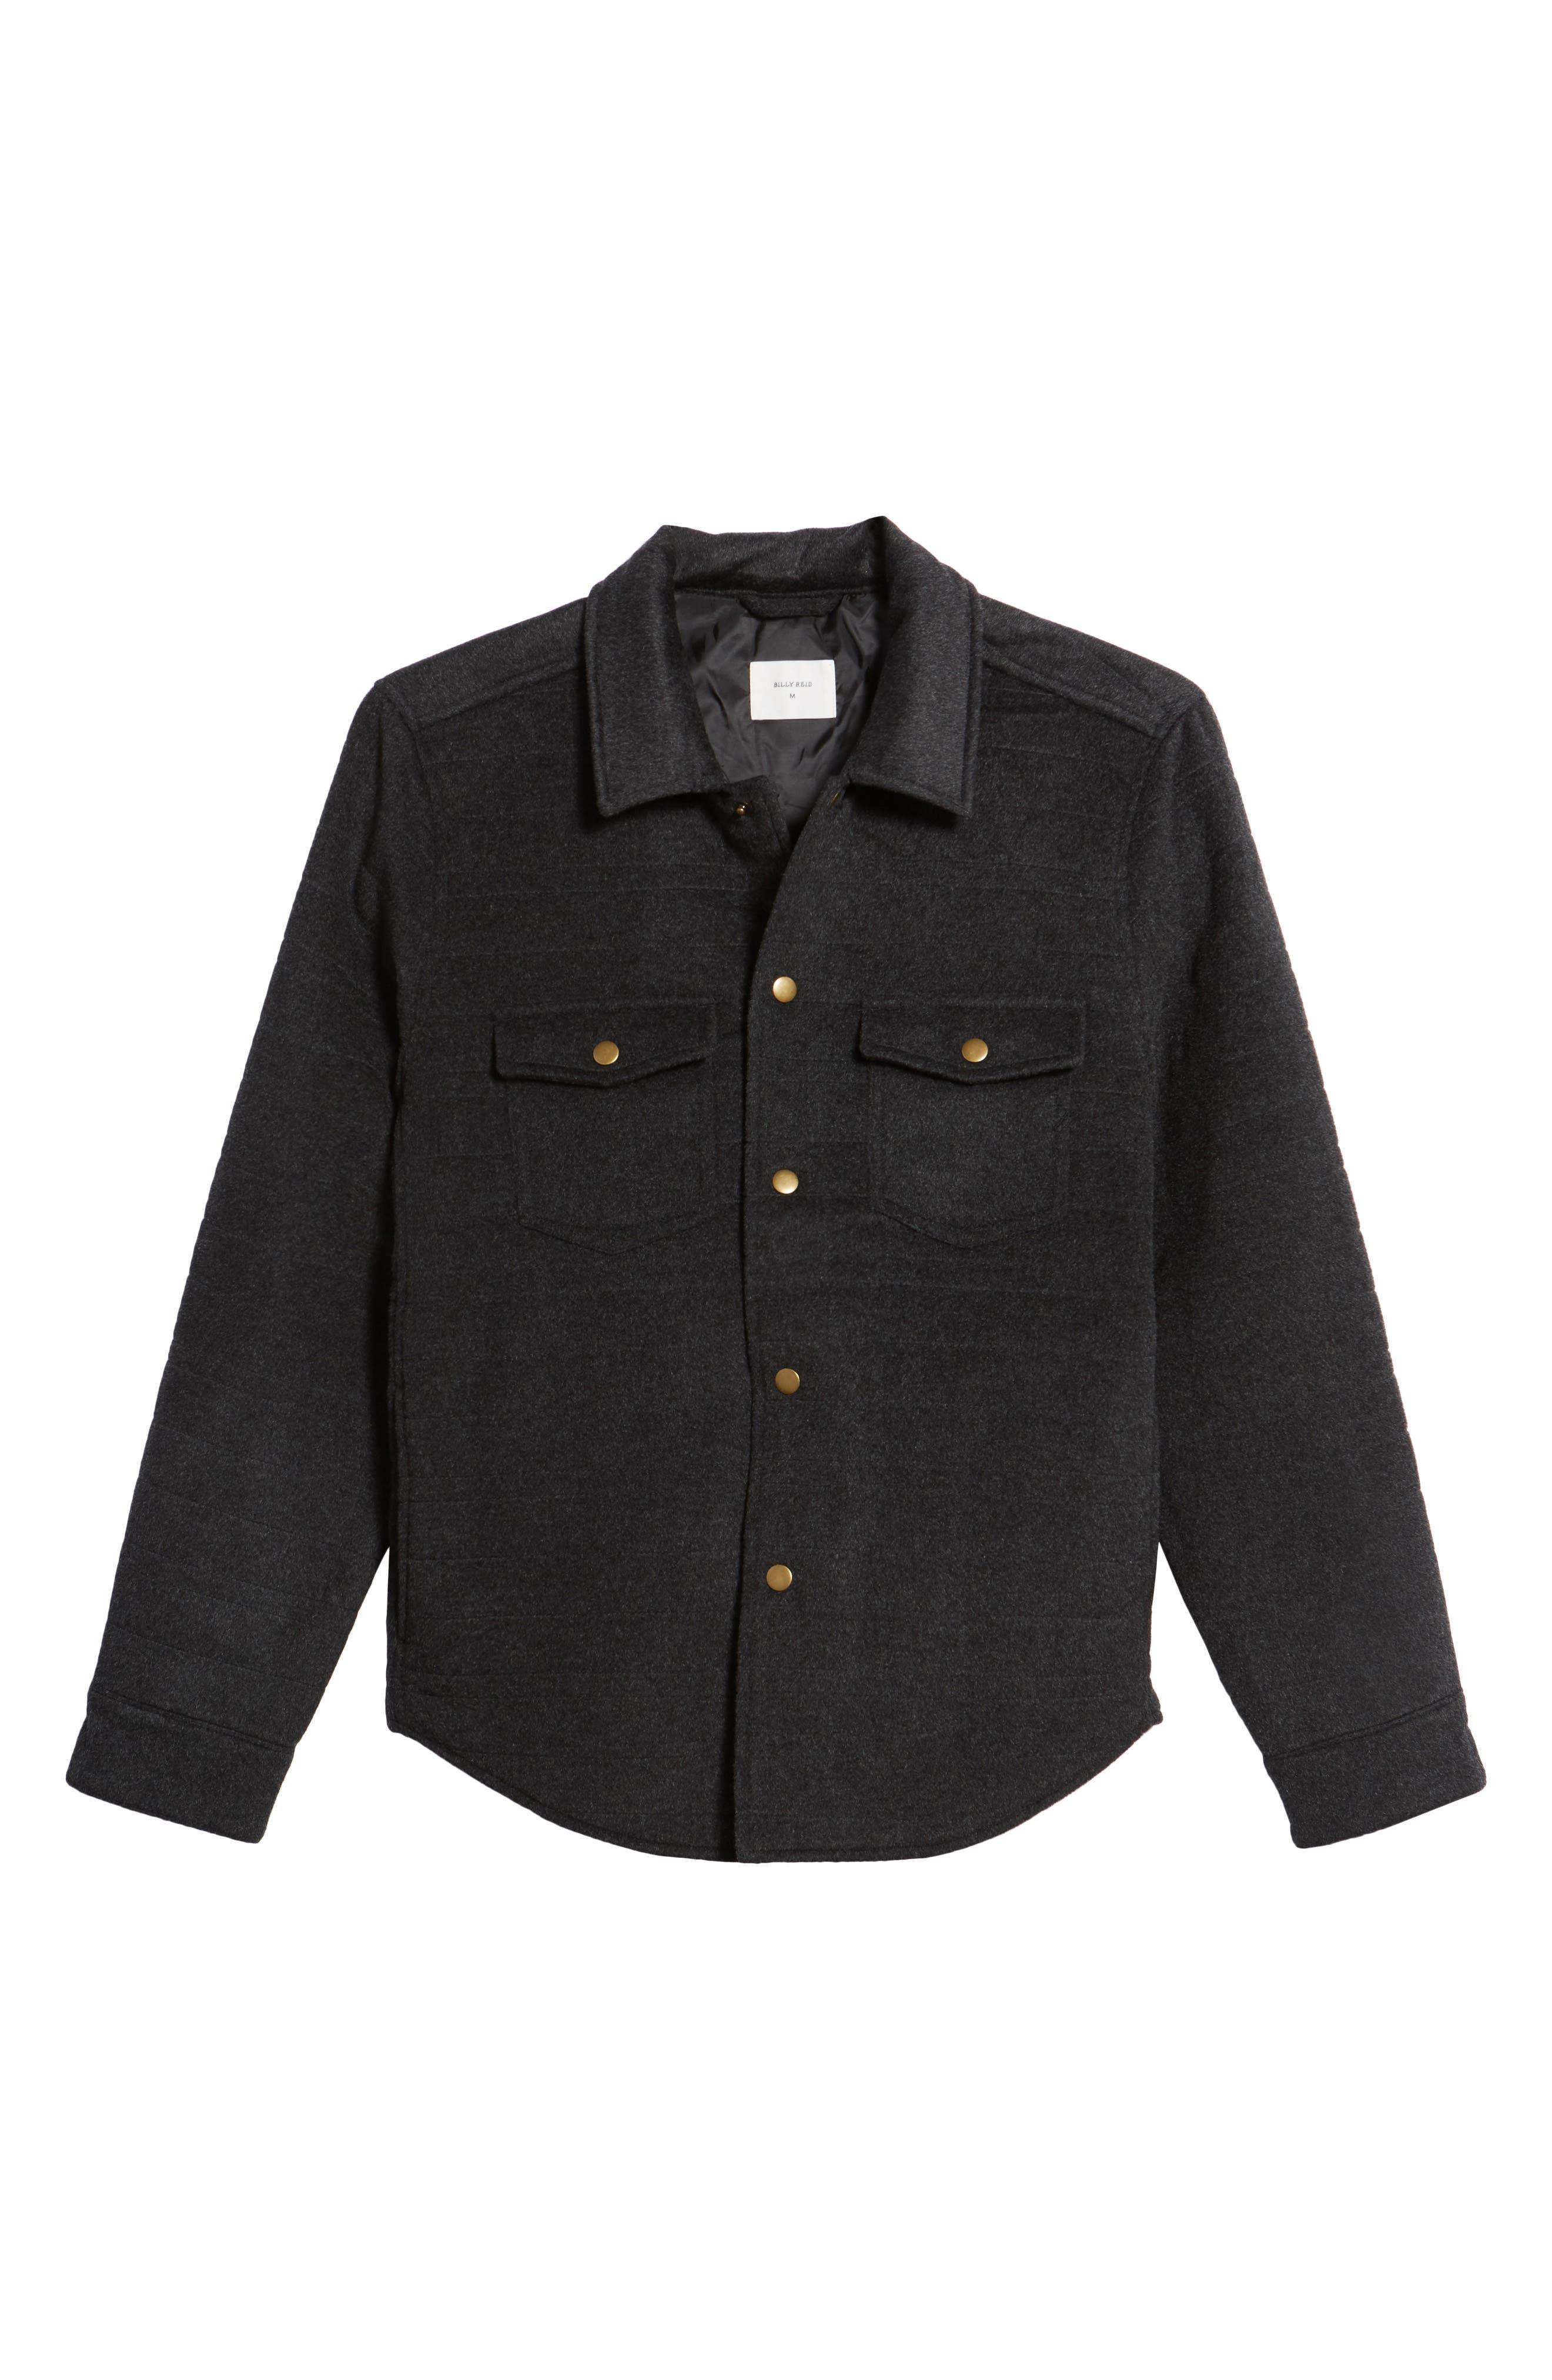 Michael Slim Fit Quilted Shirt Jacket,                             Alternate thumbnail 6, color,                             Dark Char Melange